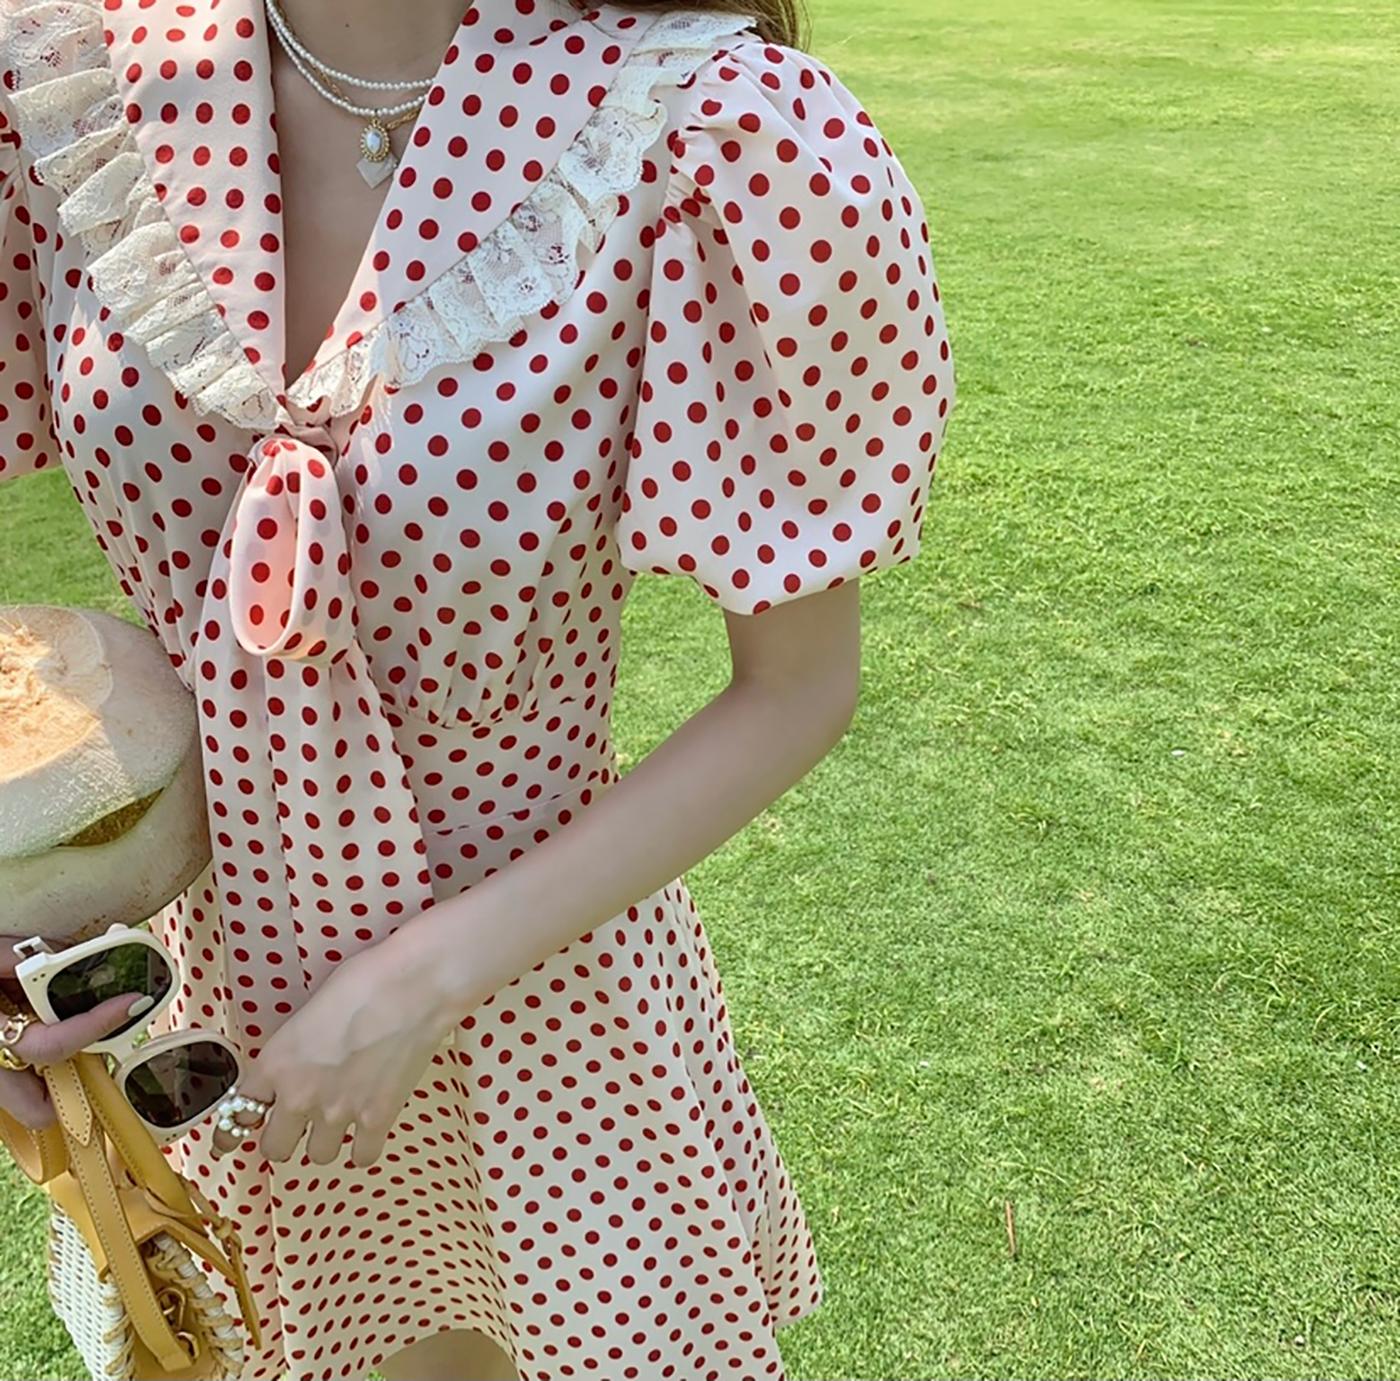 momoshero 连衣裙女2021春夏新款邻家姐姐法式气质波点泡泡袖短裙